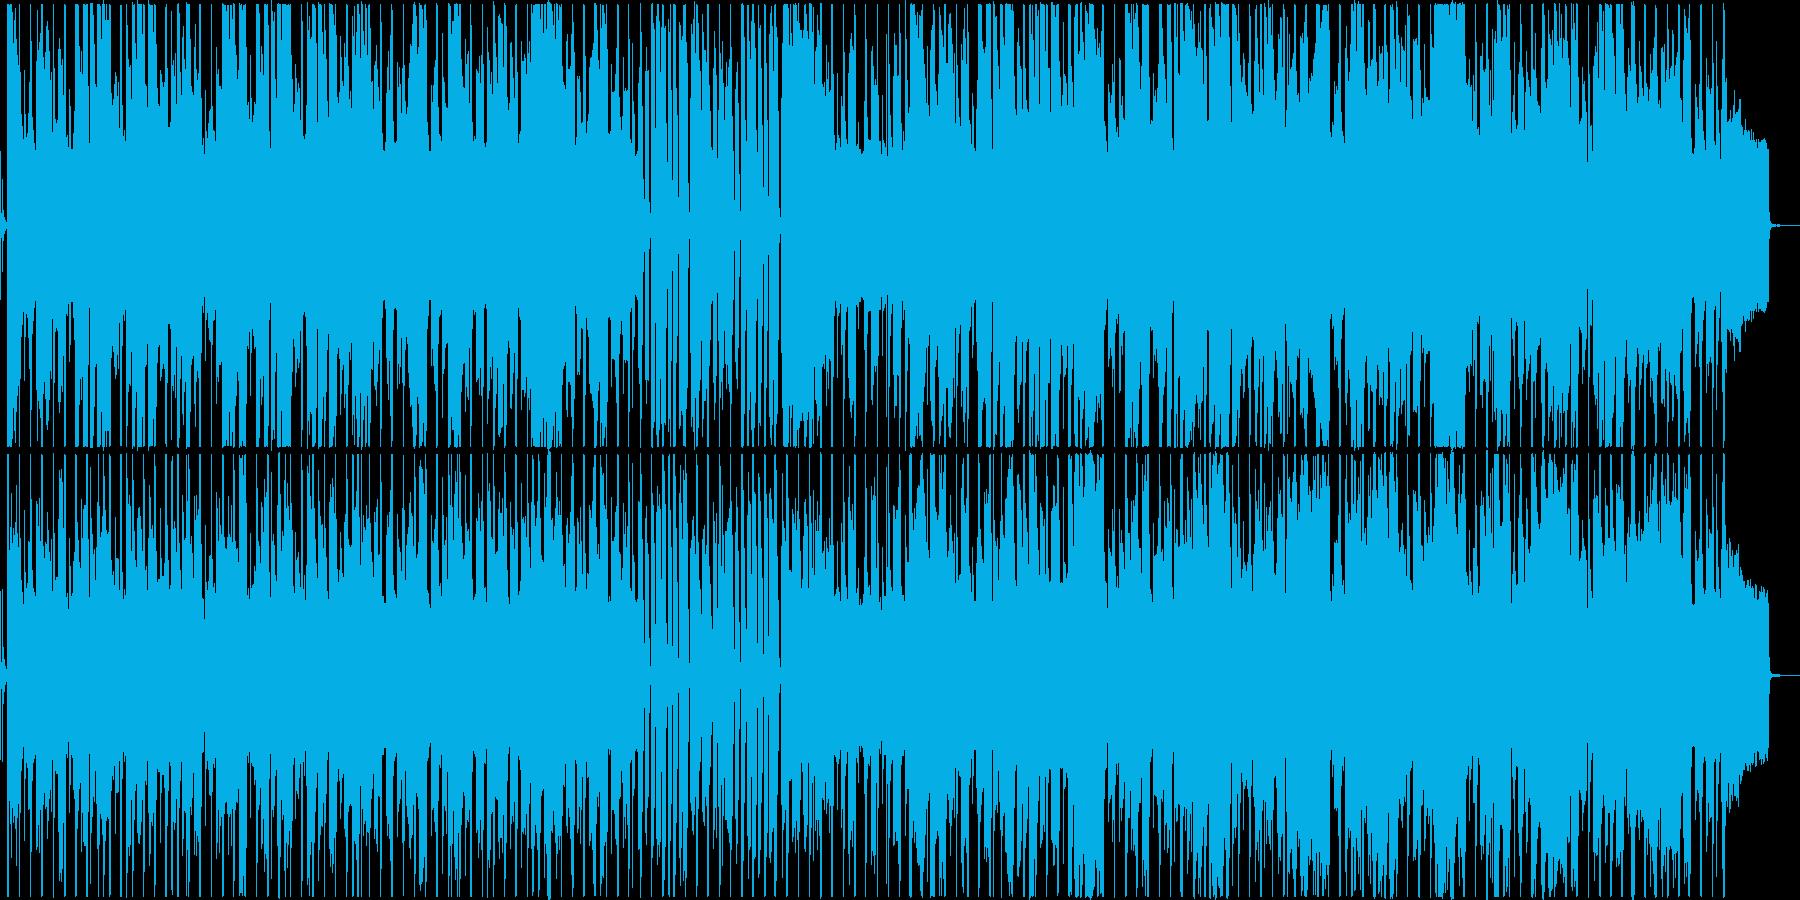 Southern Delta Bluesの再生済みの波形